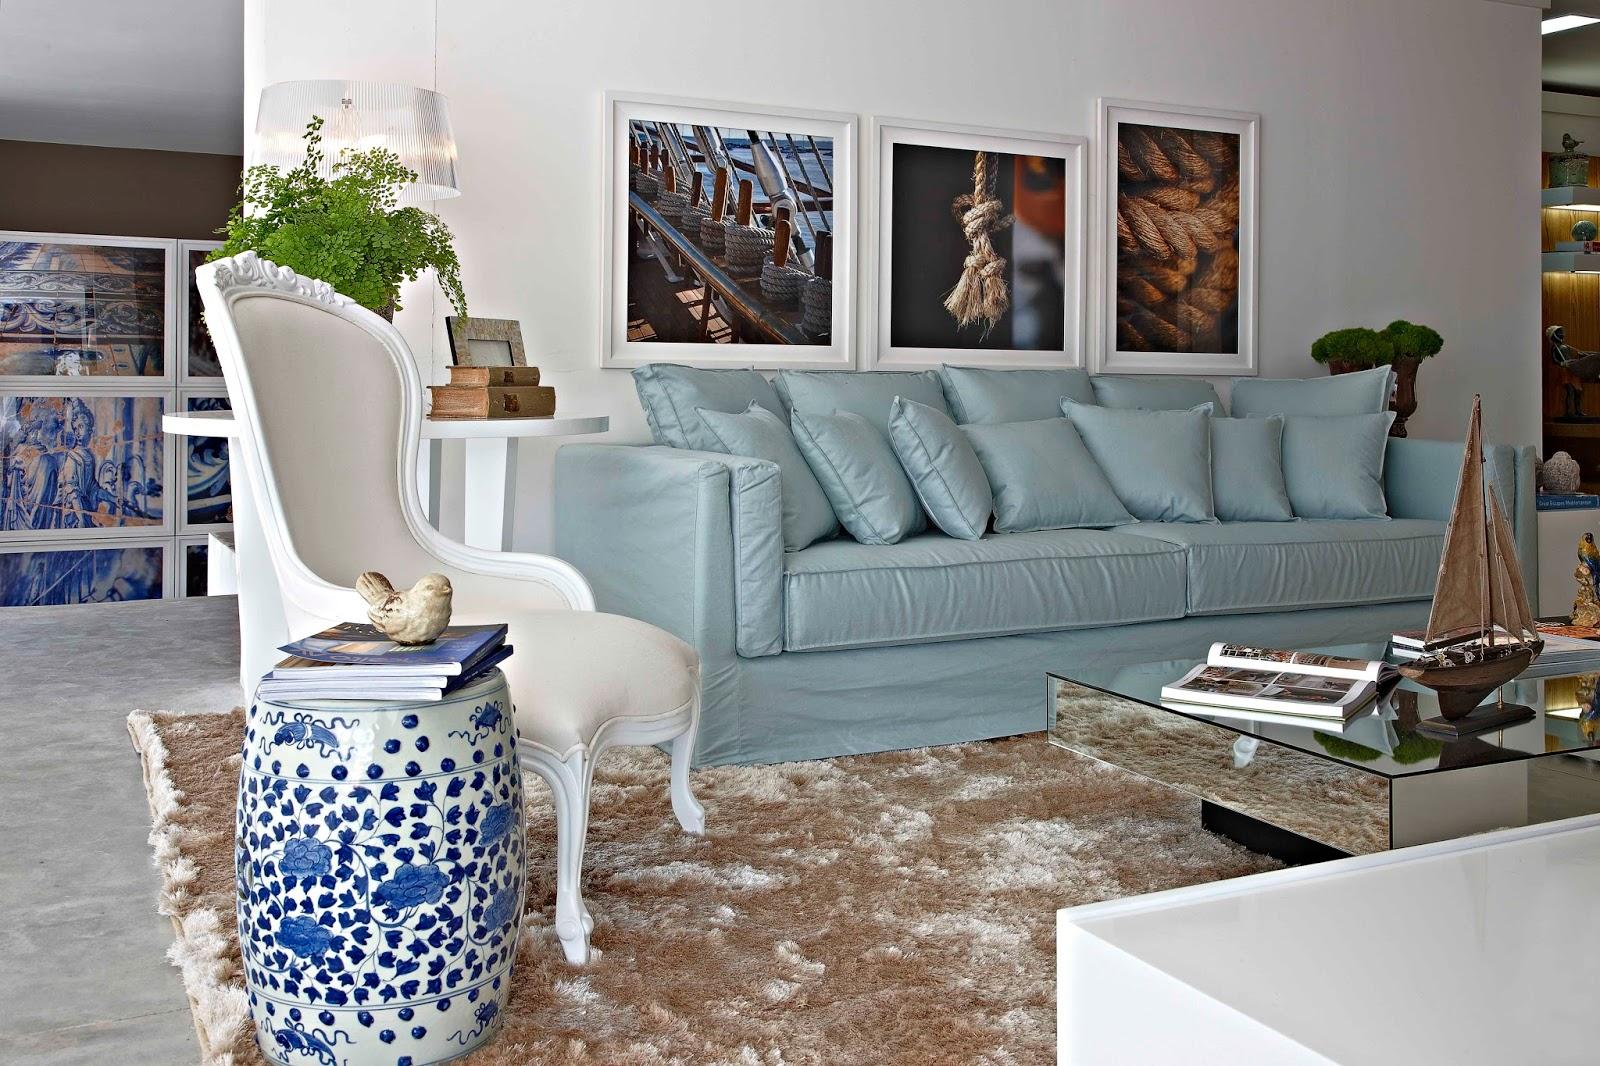 Design de interiores blog estudante interior estilos for Estilo moderno contemporaneo